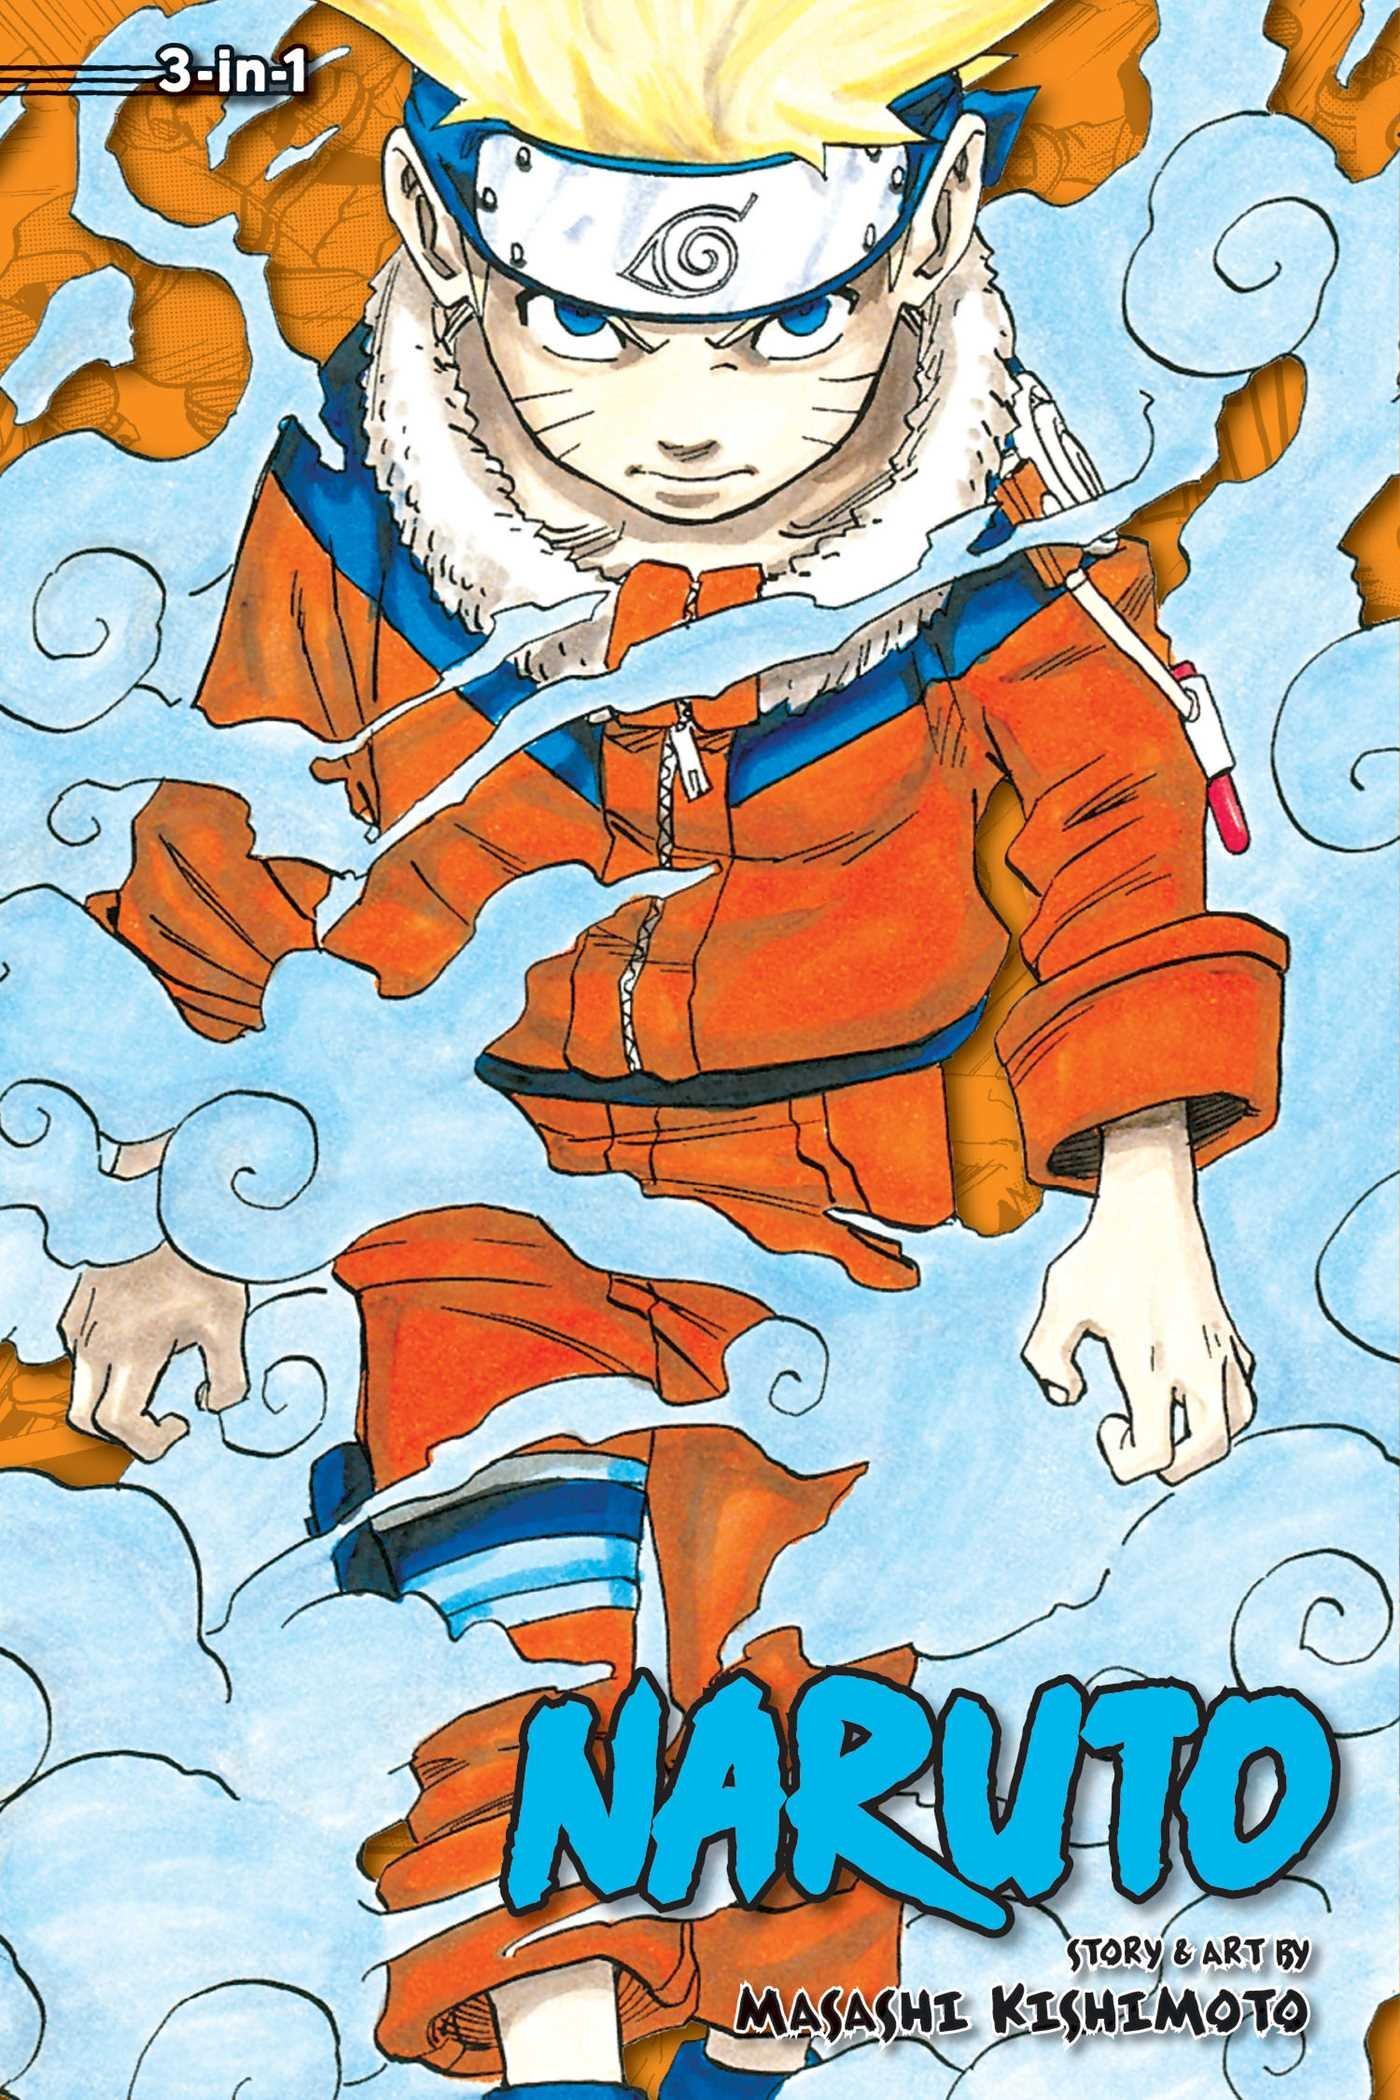 Amazon.com: Naruto (3-in-1 Edition), Vol. 2: Includes vols. 4, 5 ...